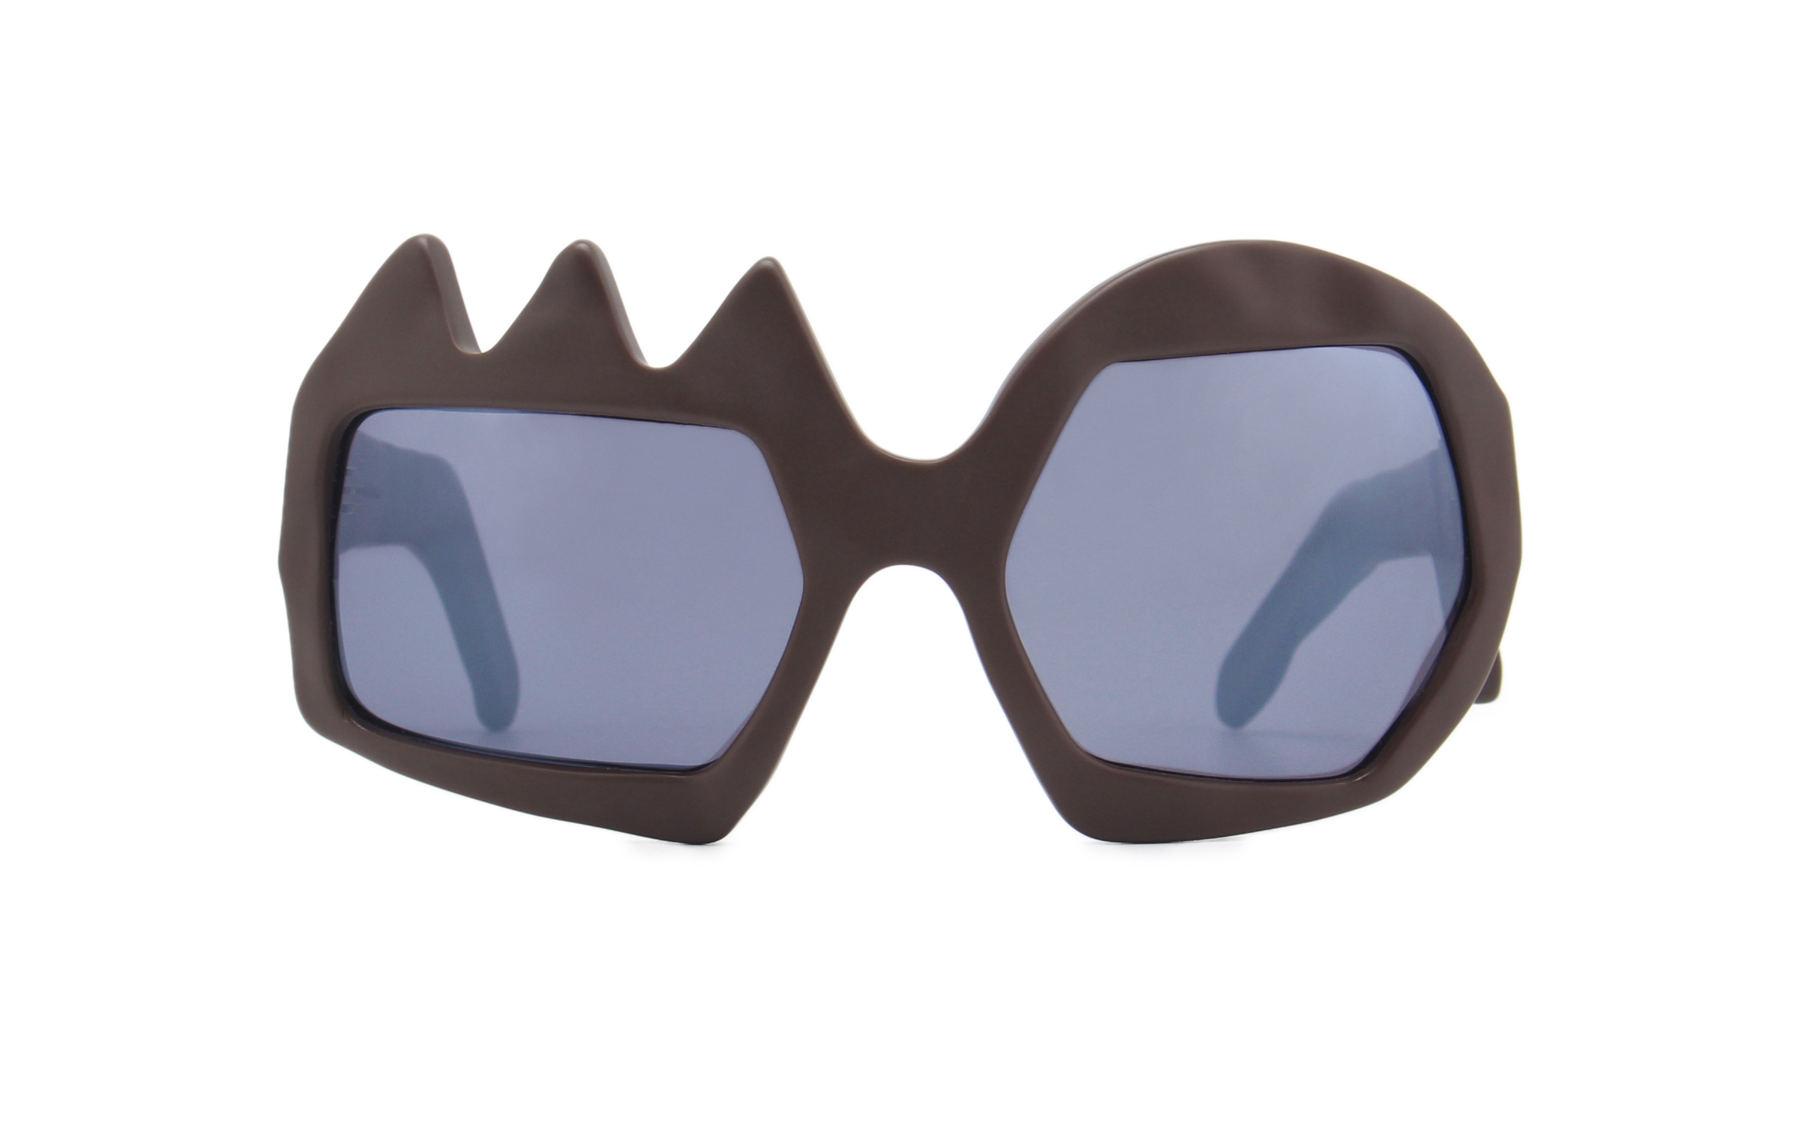 FAKBYFAK x Walter Van Beirendonck  Lightning Sunglasses. Brown Code: FBF-09-11-02